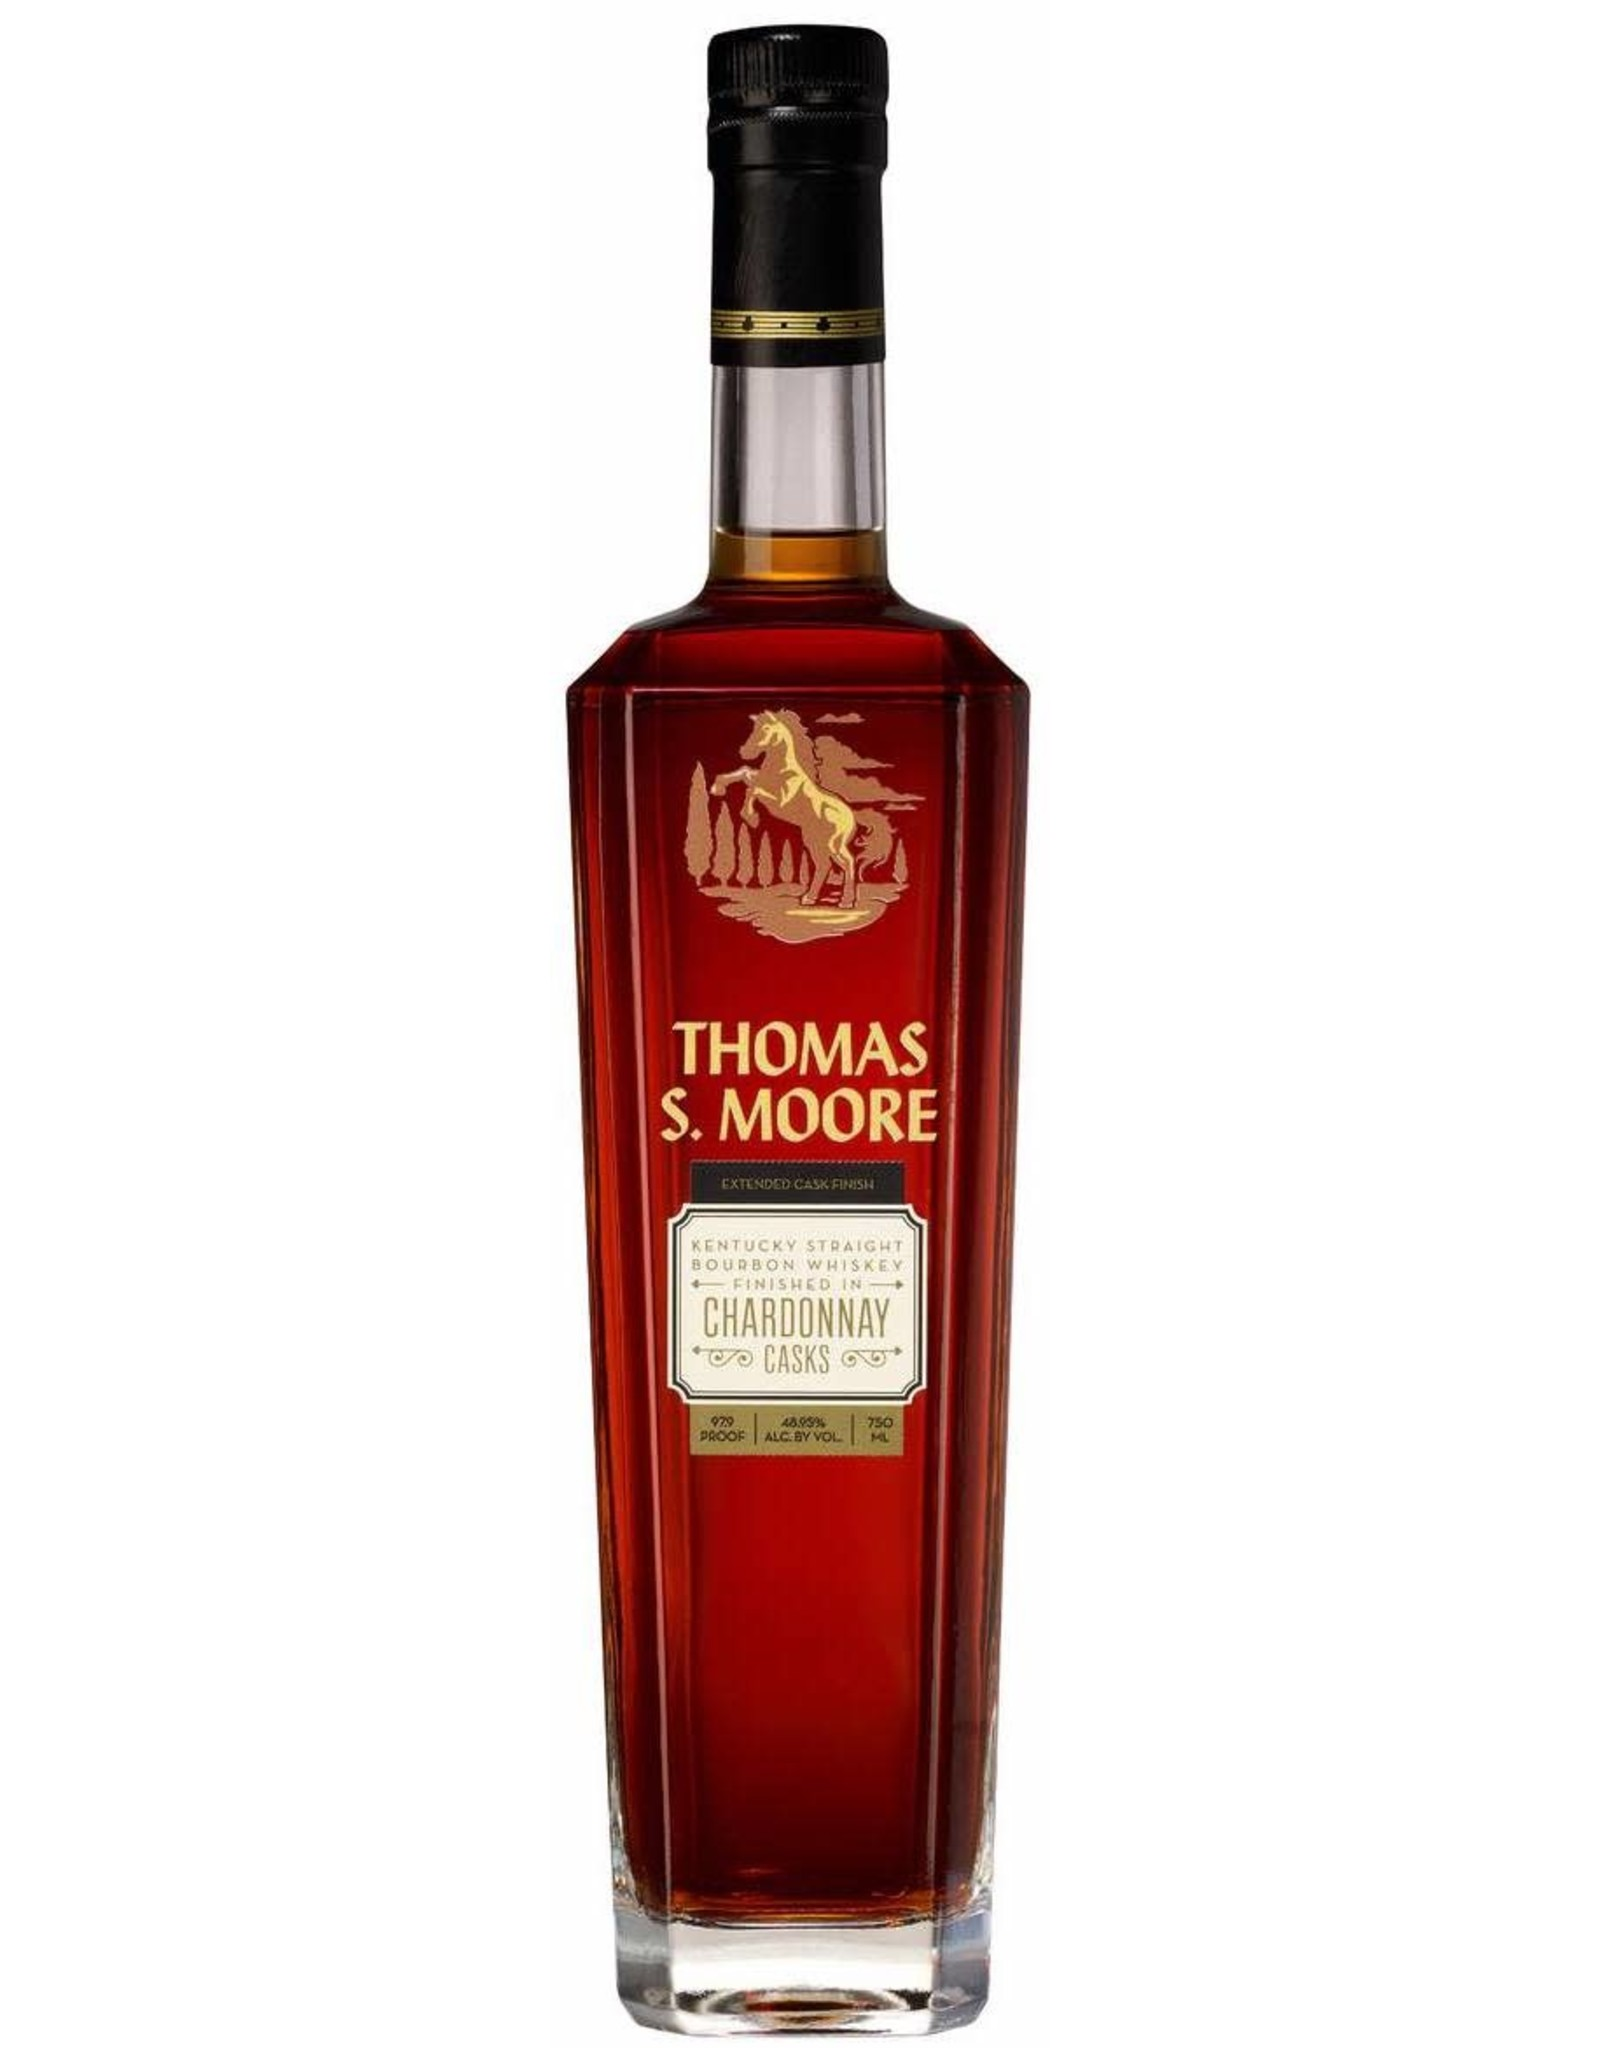 Thomas S. Moore Chardonnay Cask Bourbon